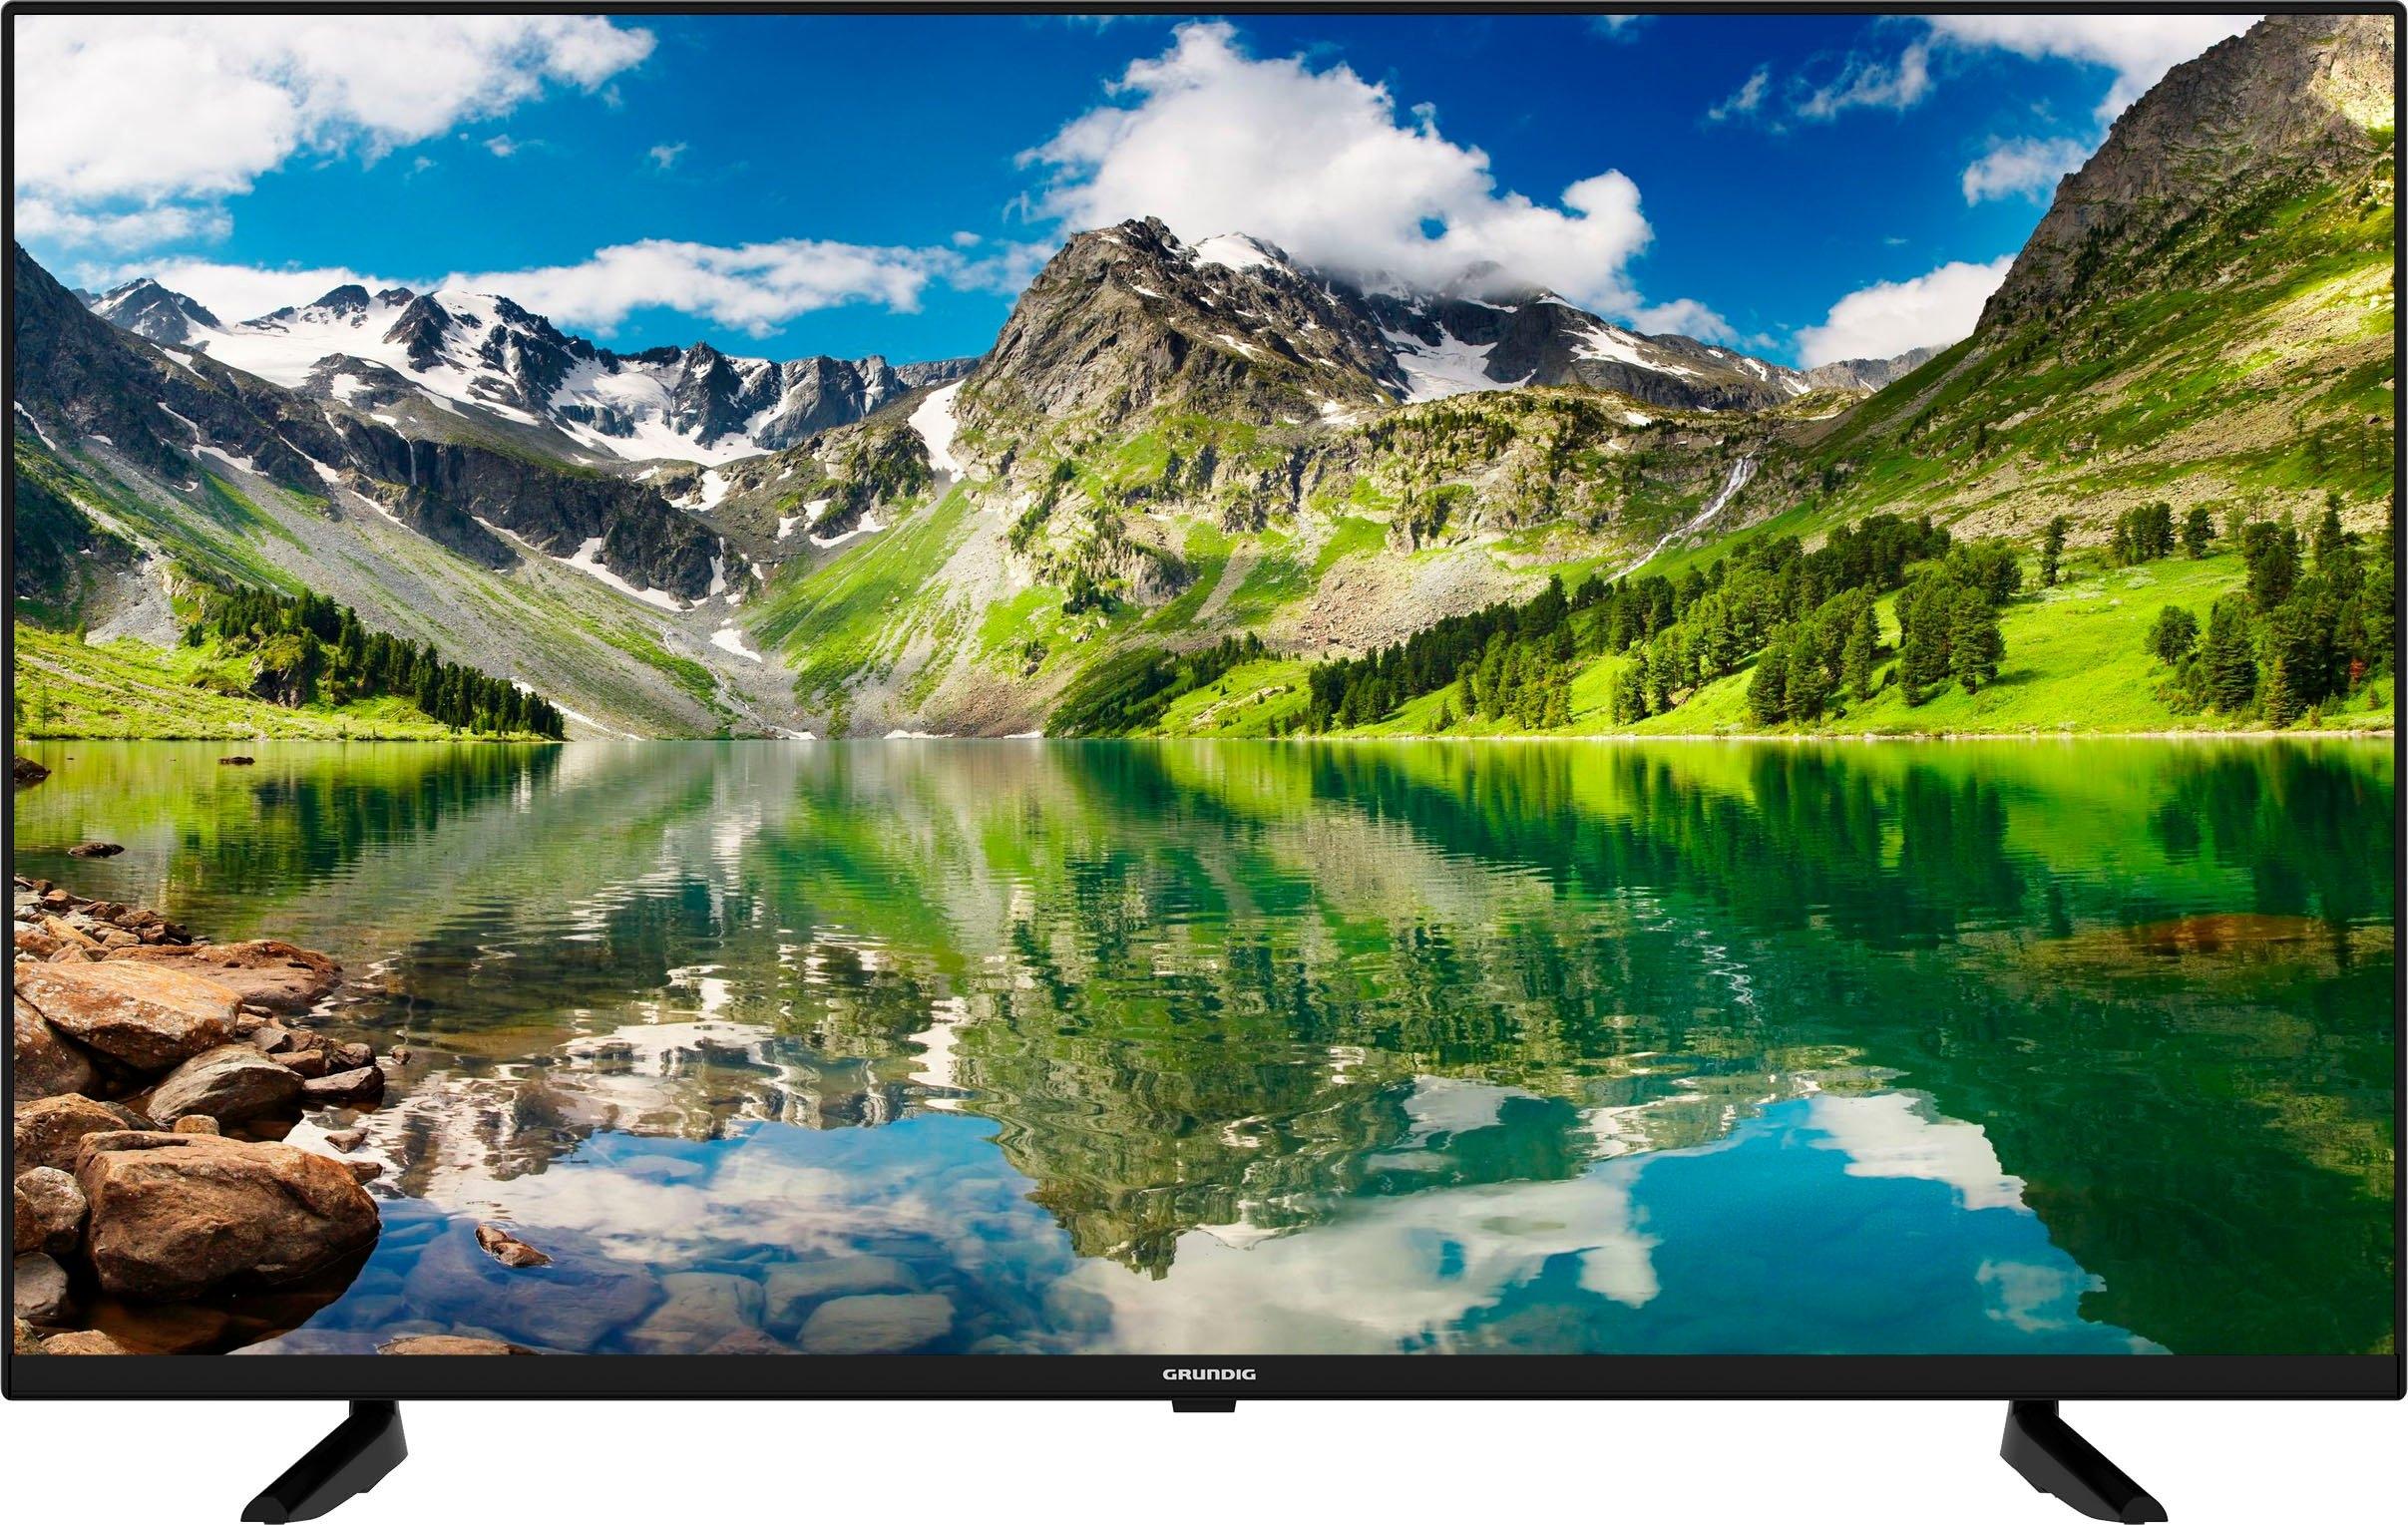 Grundig led-TV 43 VOE 20 UHS000, 108 cm / 43